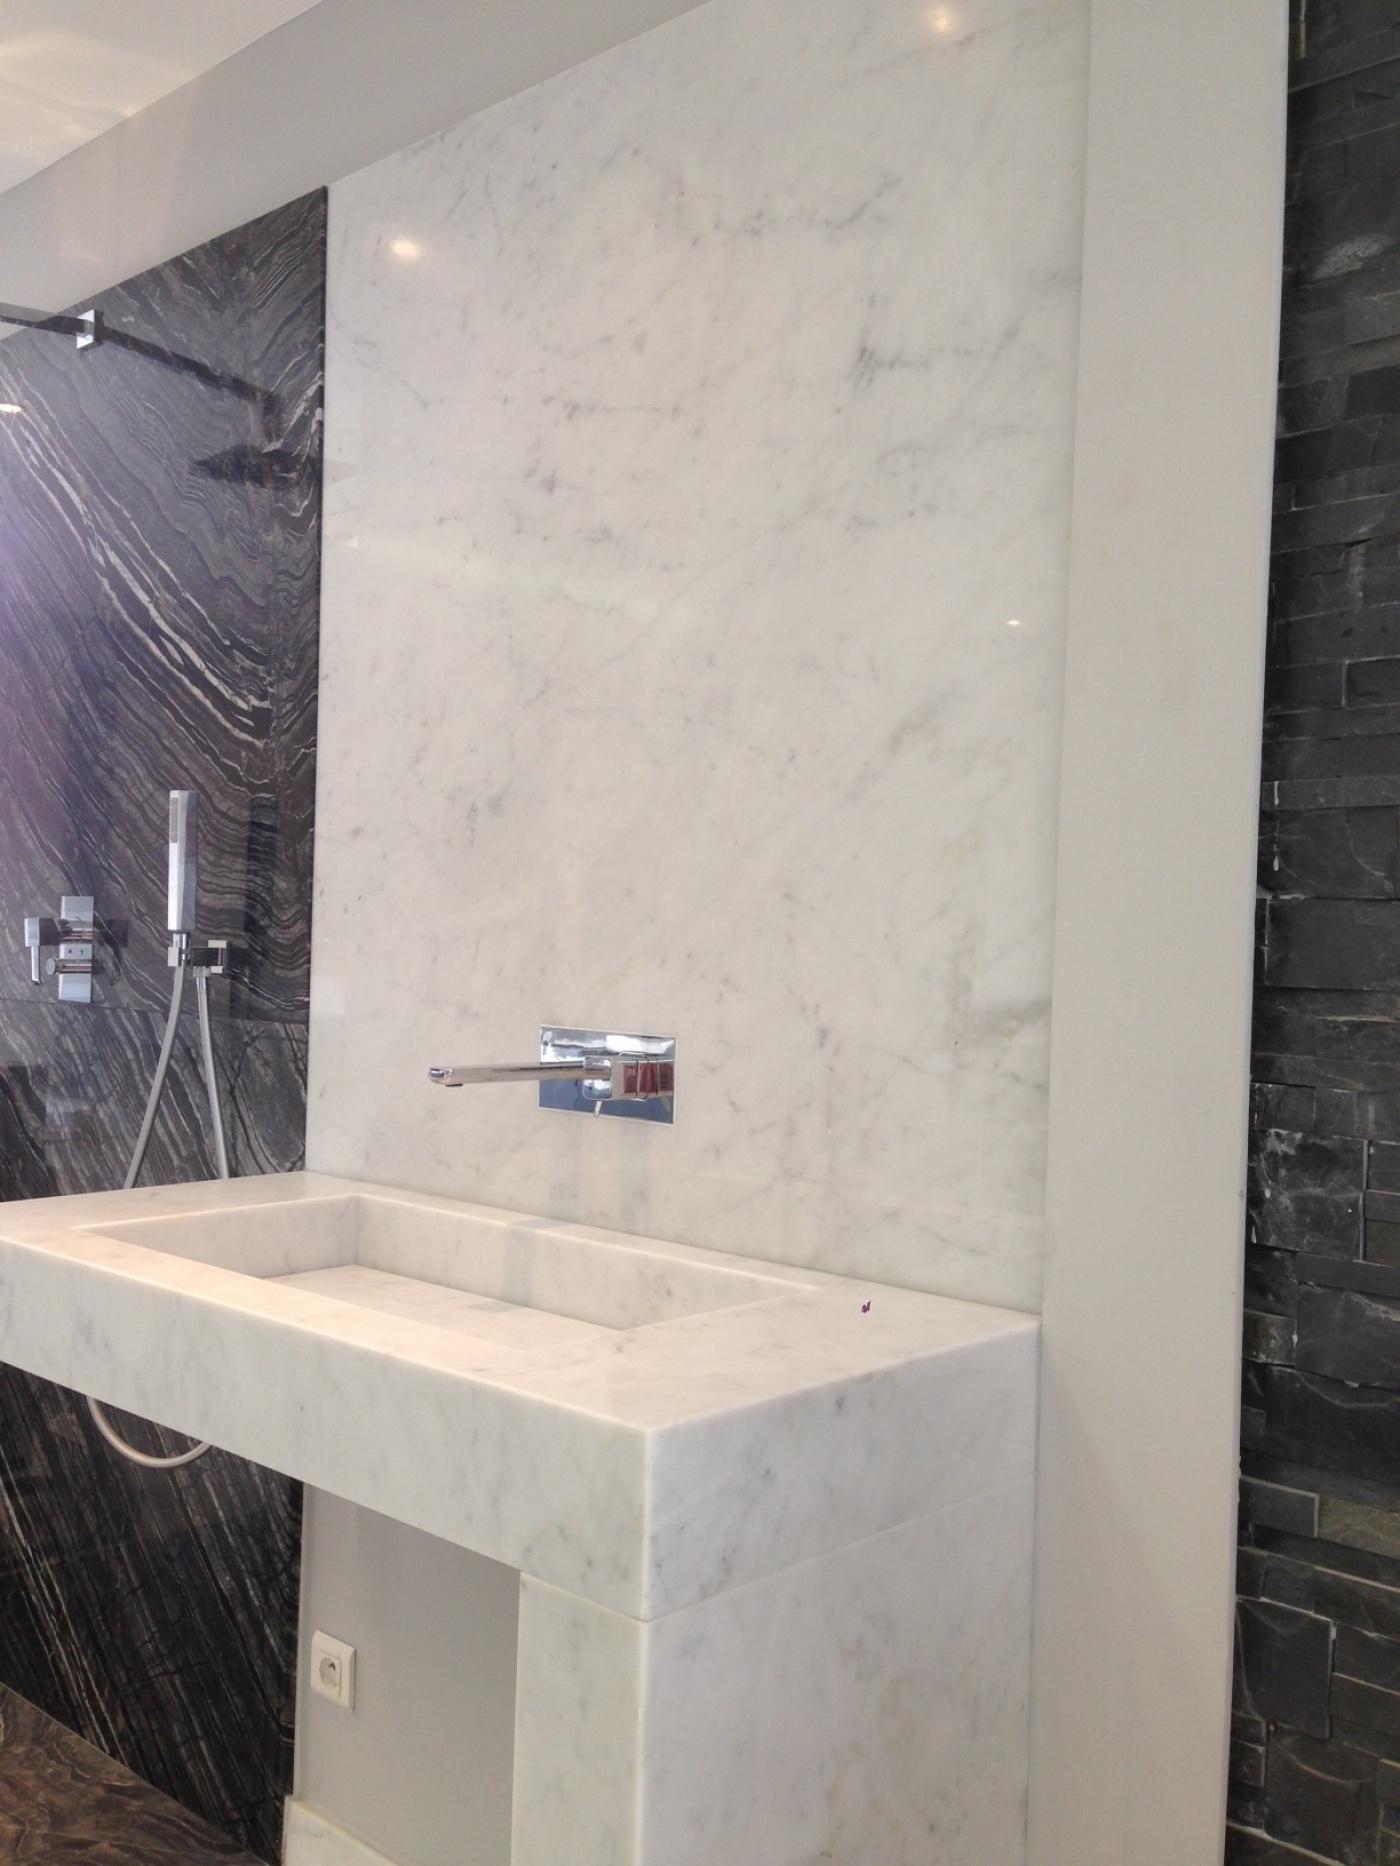 Accessoires, Vasques Bianco Carrara   Salle de bains en marbre Blanc de Carrare